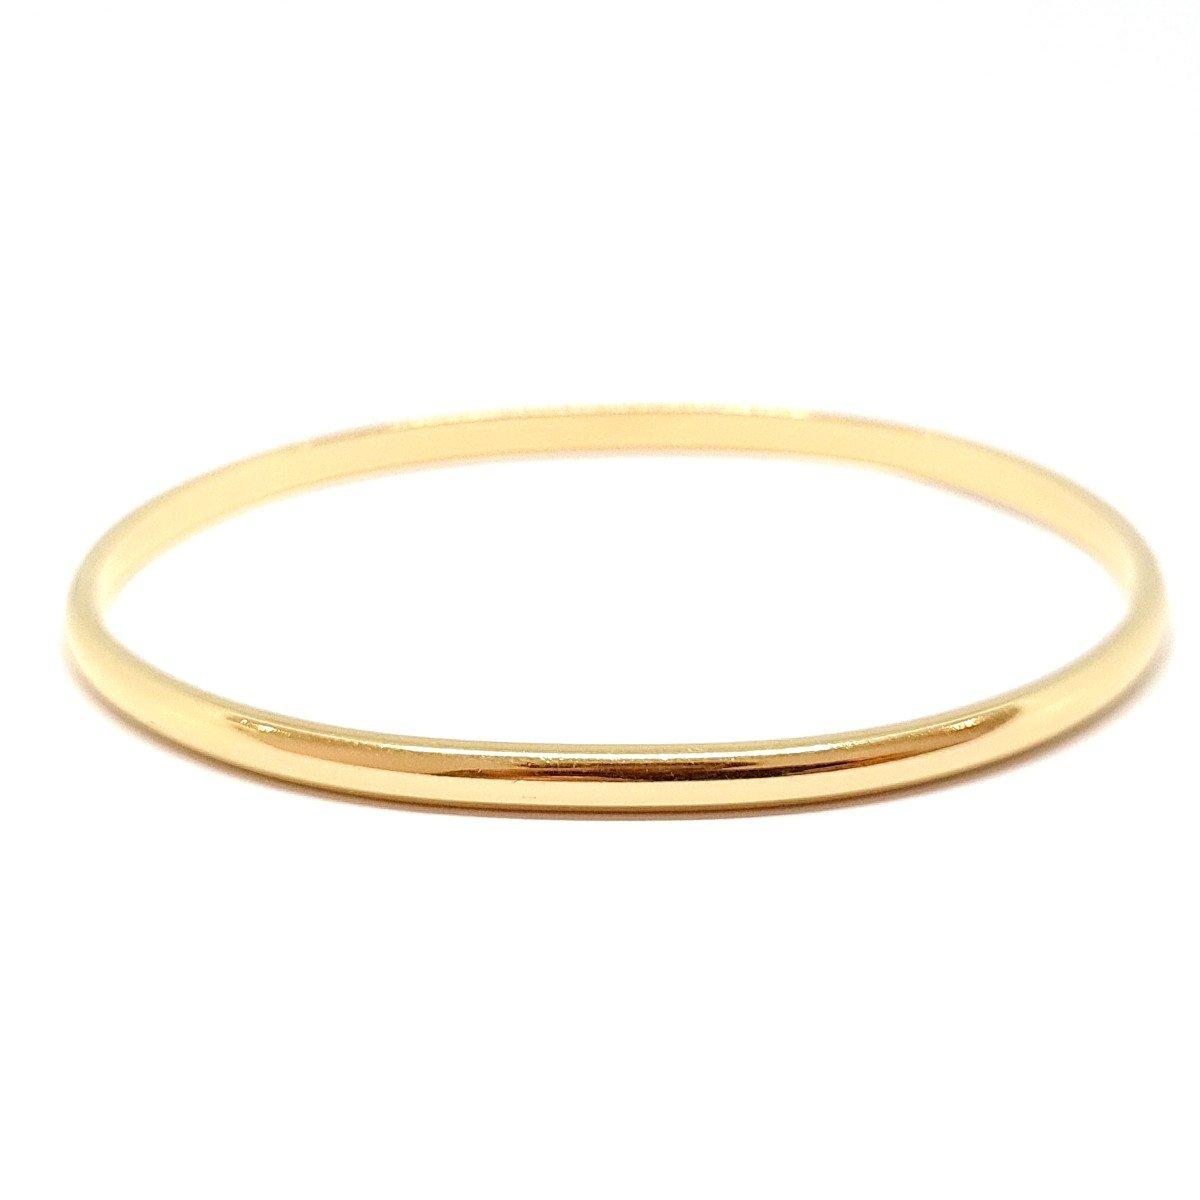 18k Yellow Gold Rigid Bangle Bracelet-photo-2